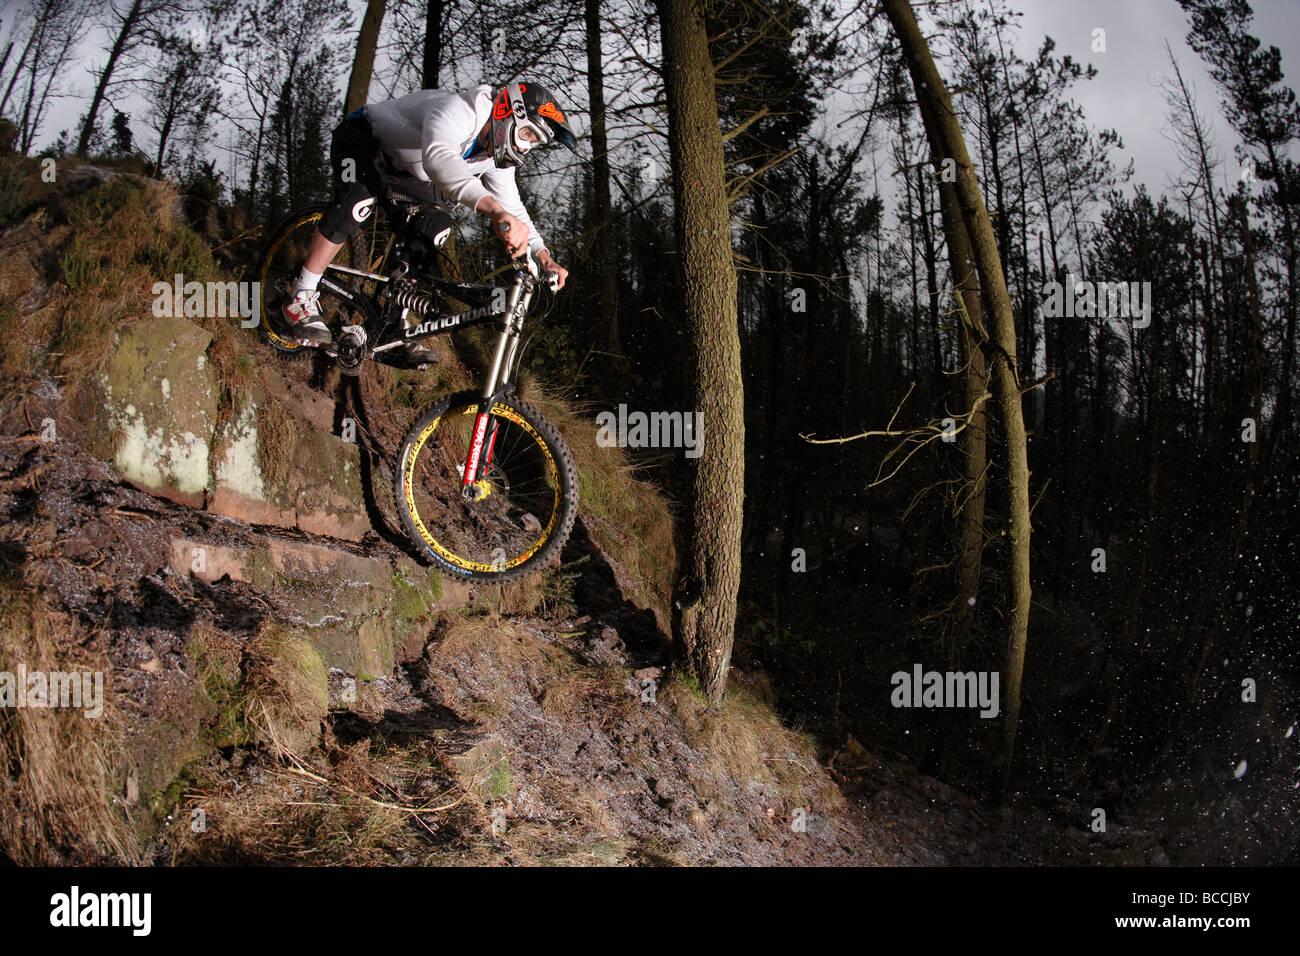 Mountain biker rides down steep forest terrain - Stock Image